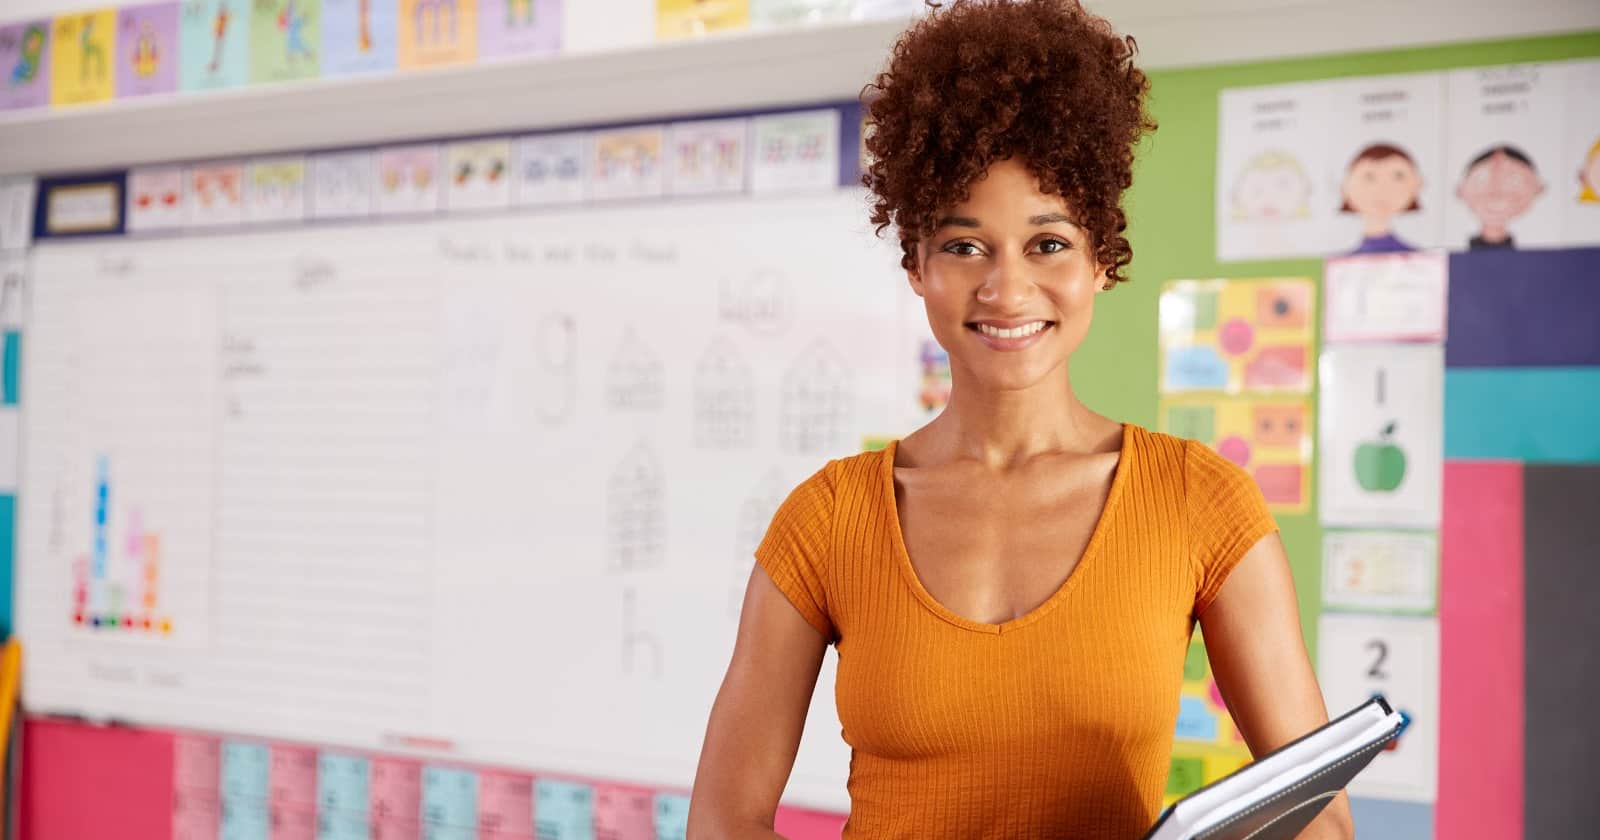 6 Reasons Everyone Should Consider A Career In Teaching